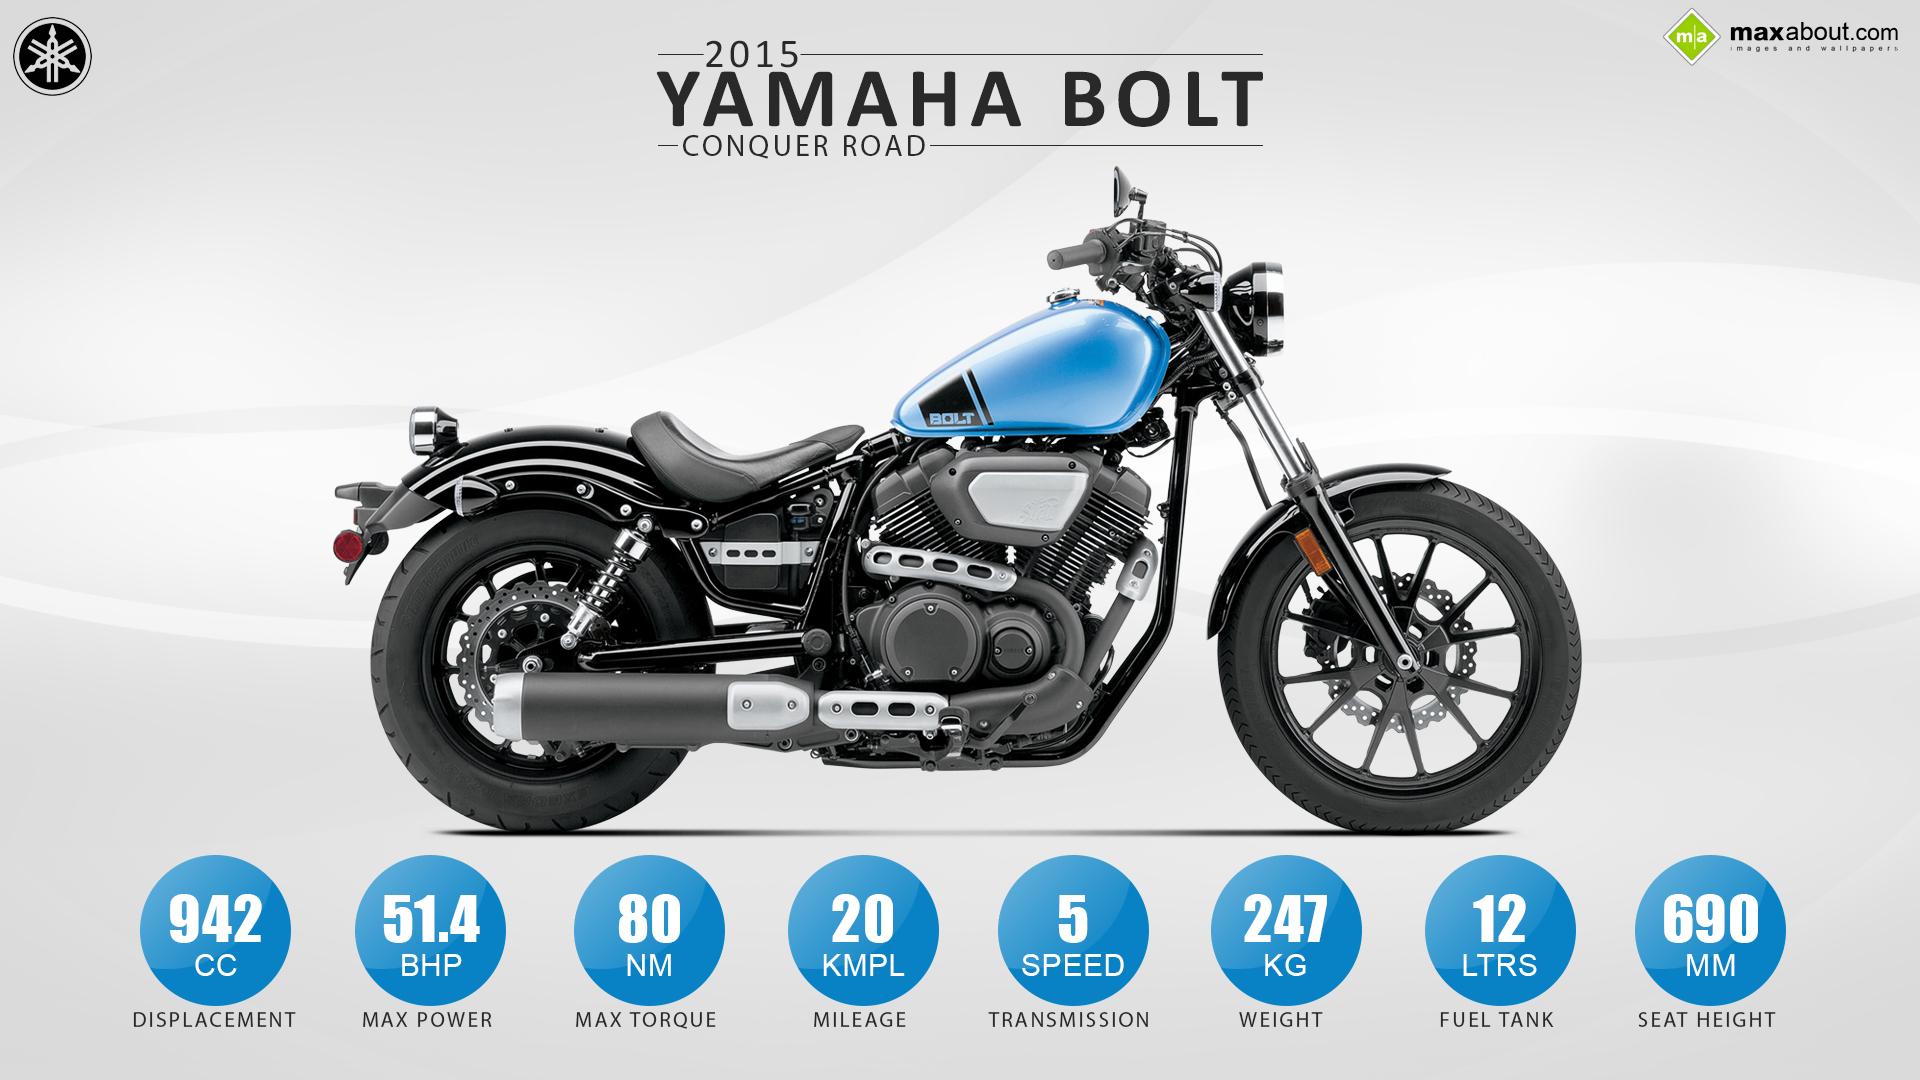 2015 Yamaha Bolt Conquer Road 1920x1080